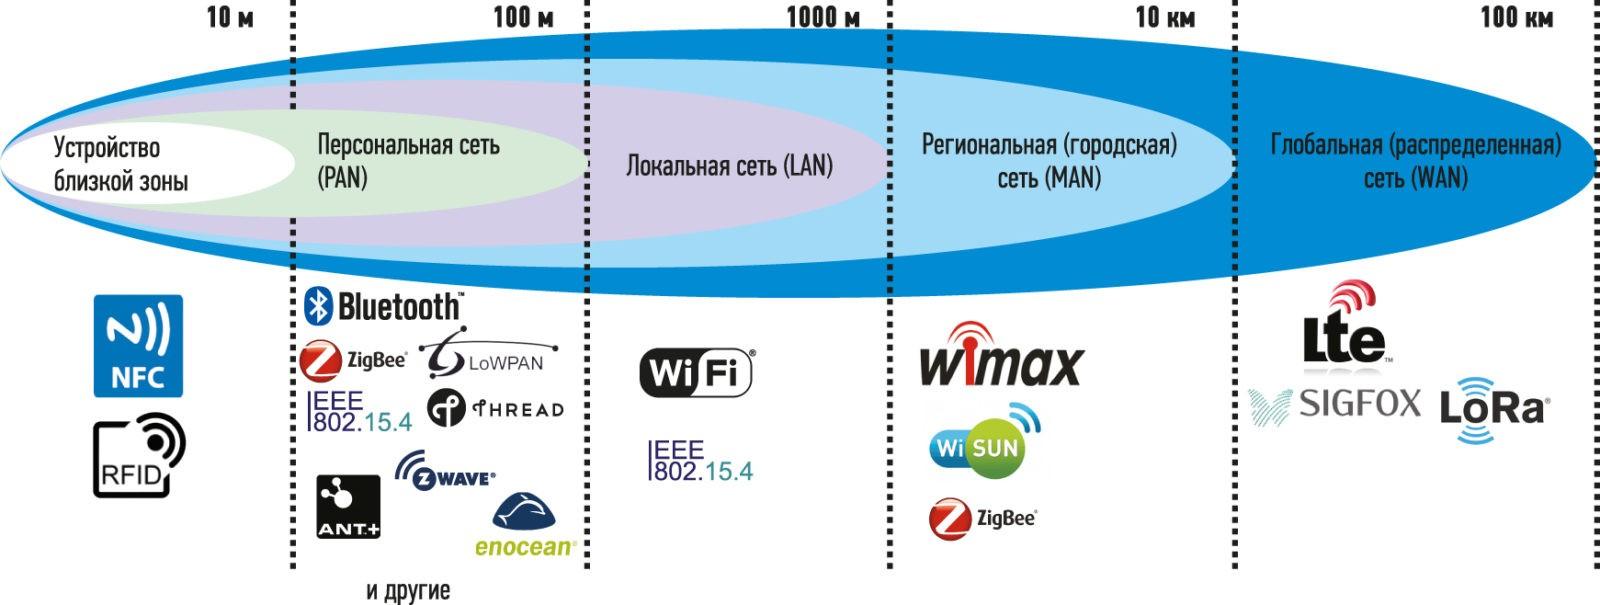 Протоколы WiFi